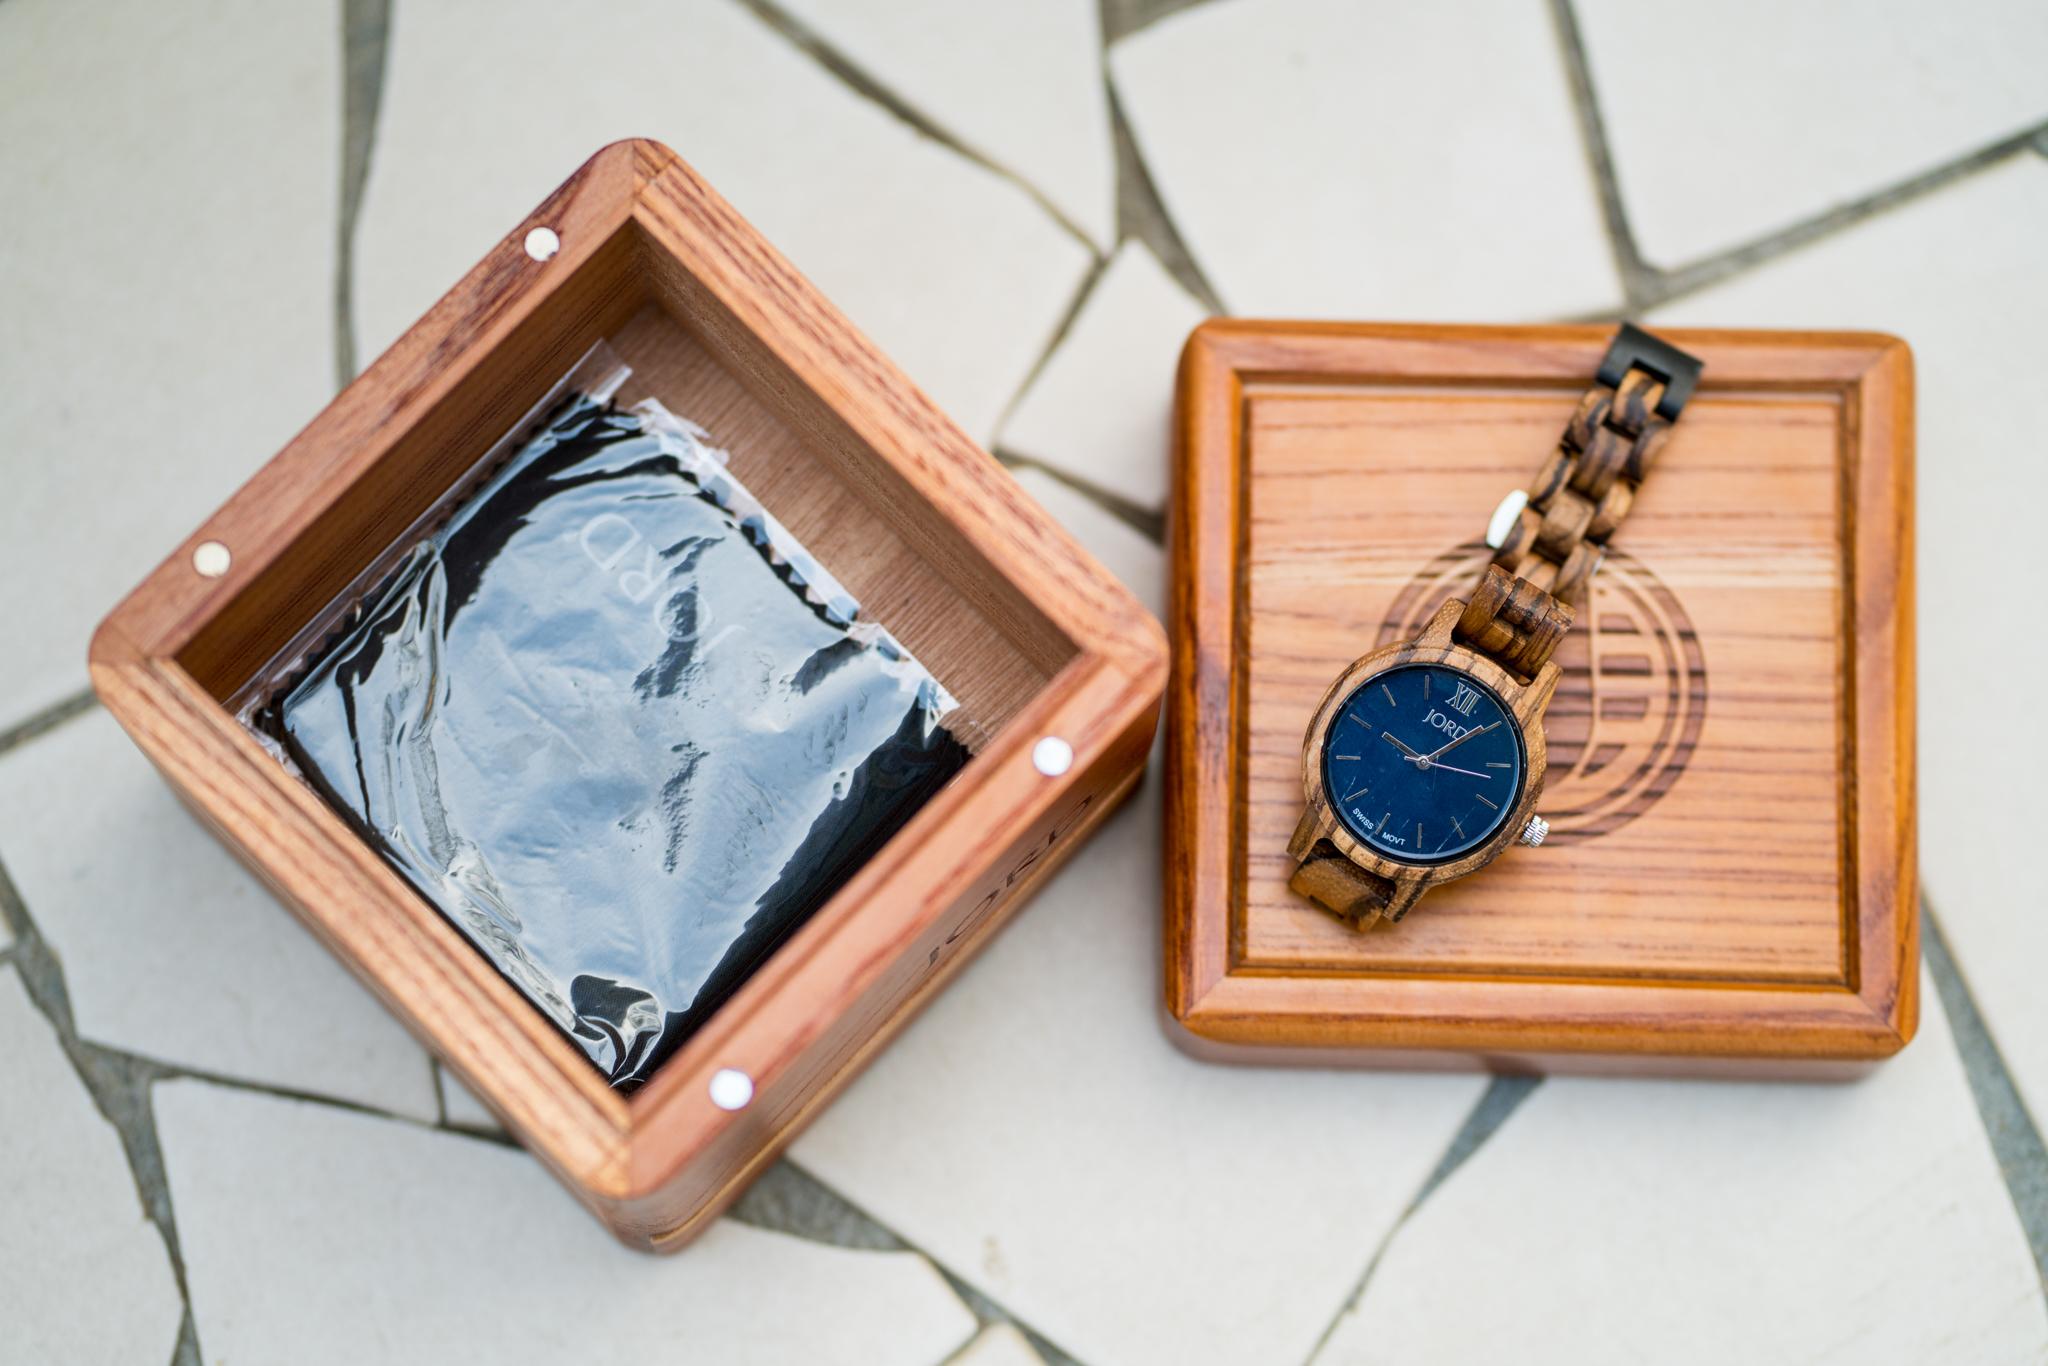 JORD watch, wood watch, unique watch, fall style